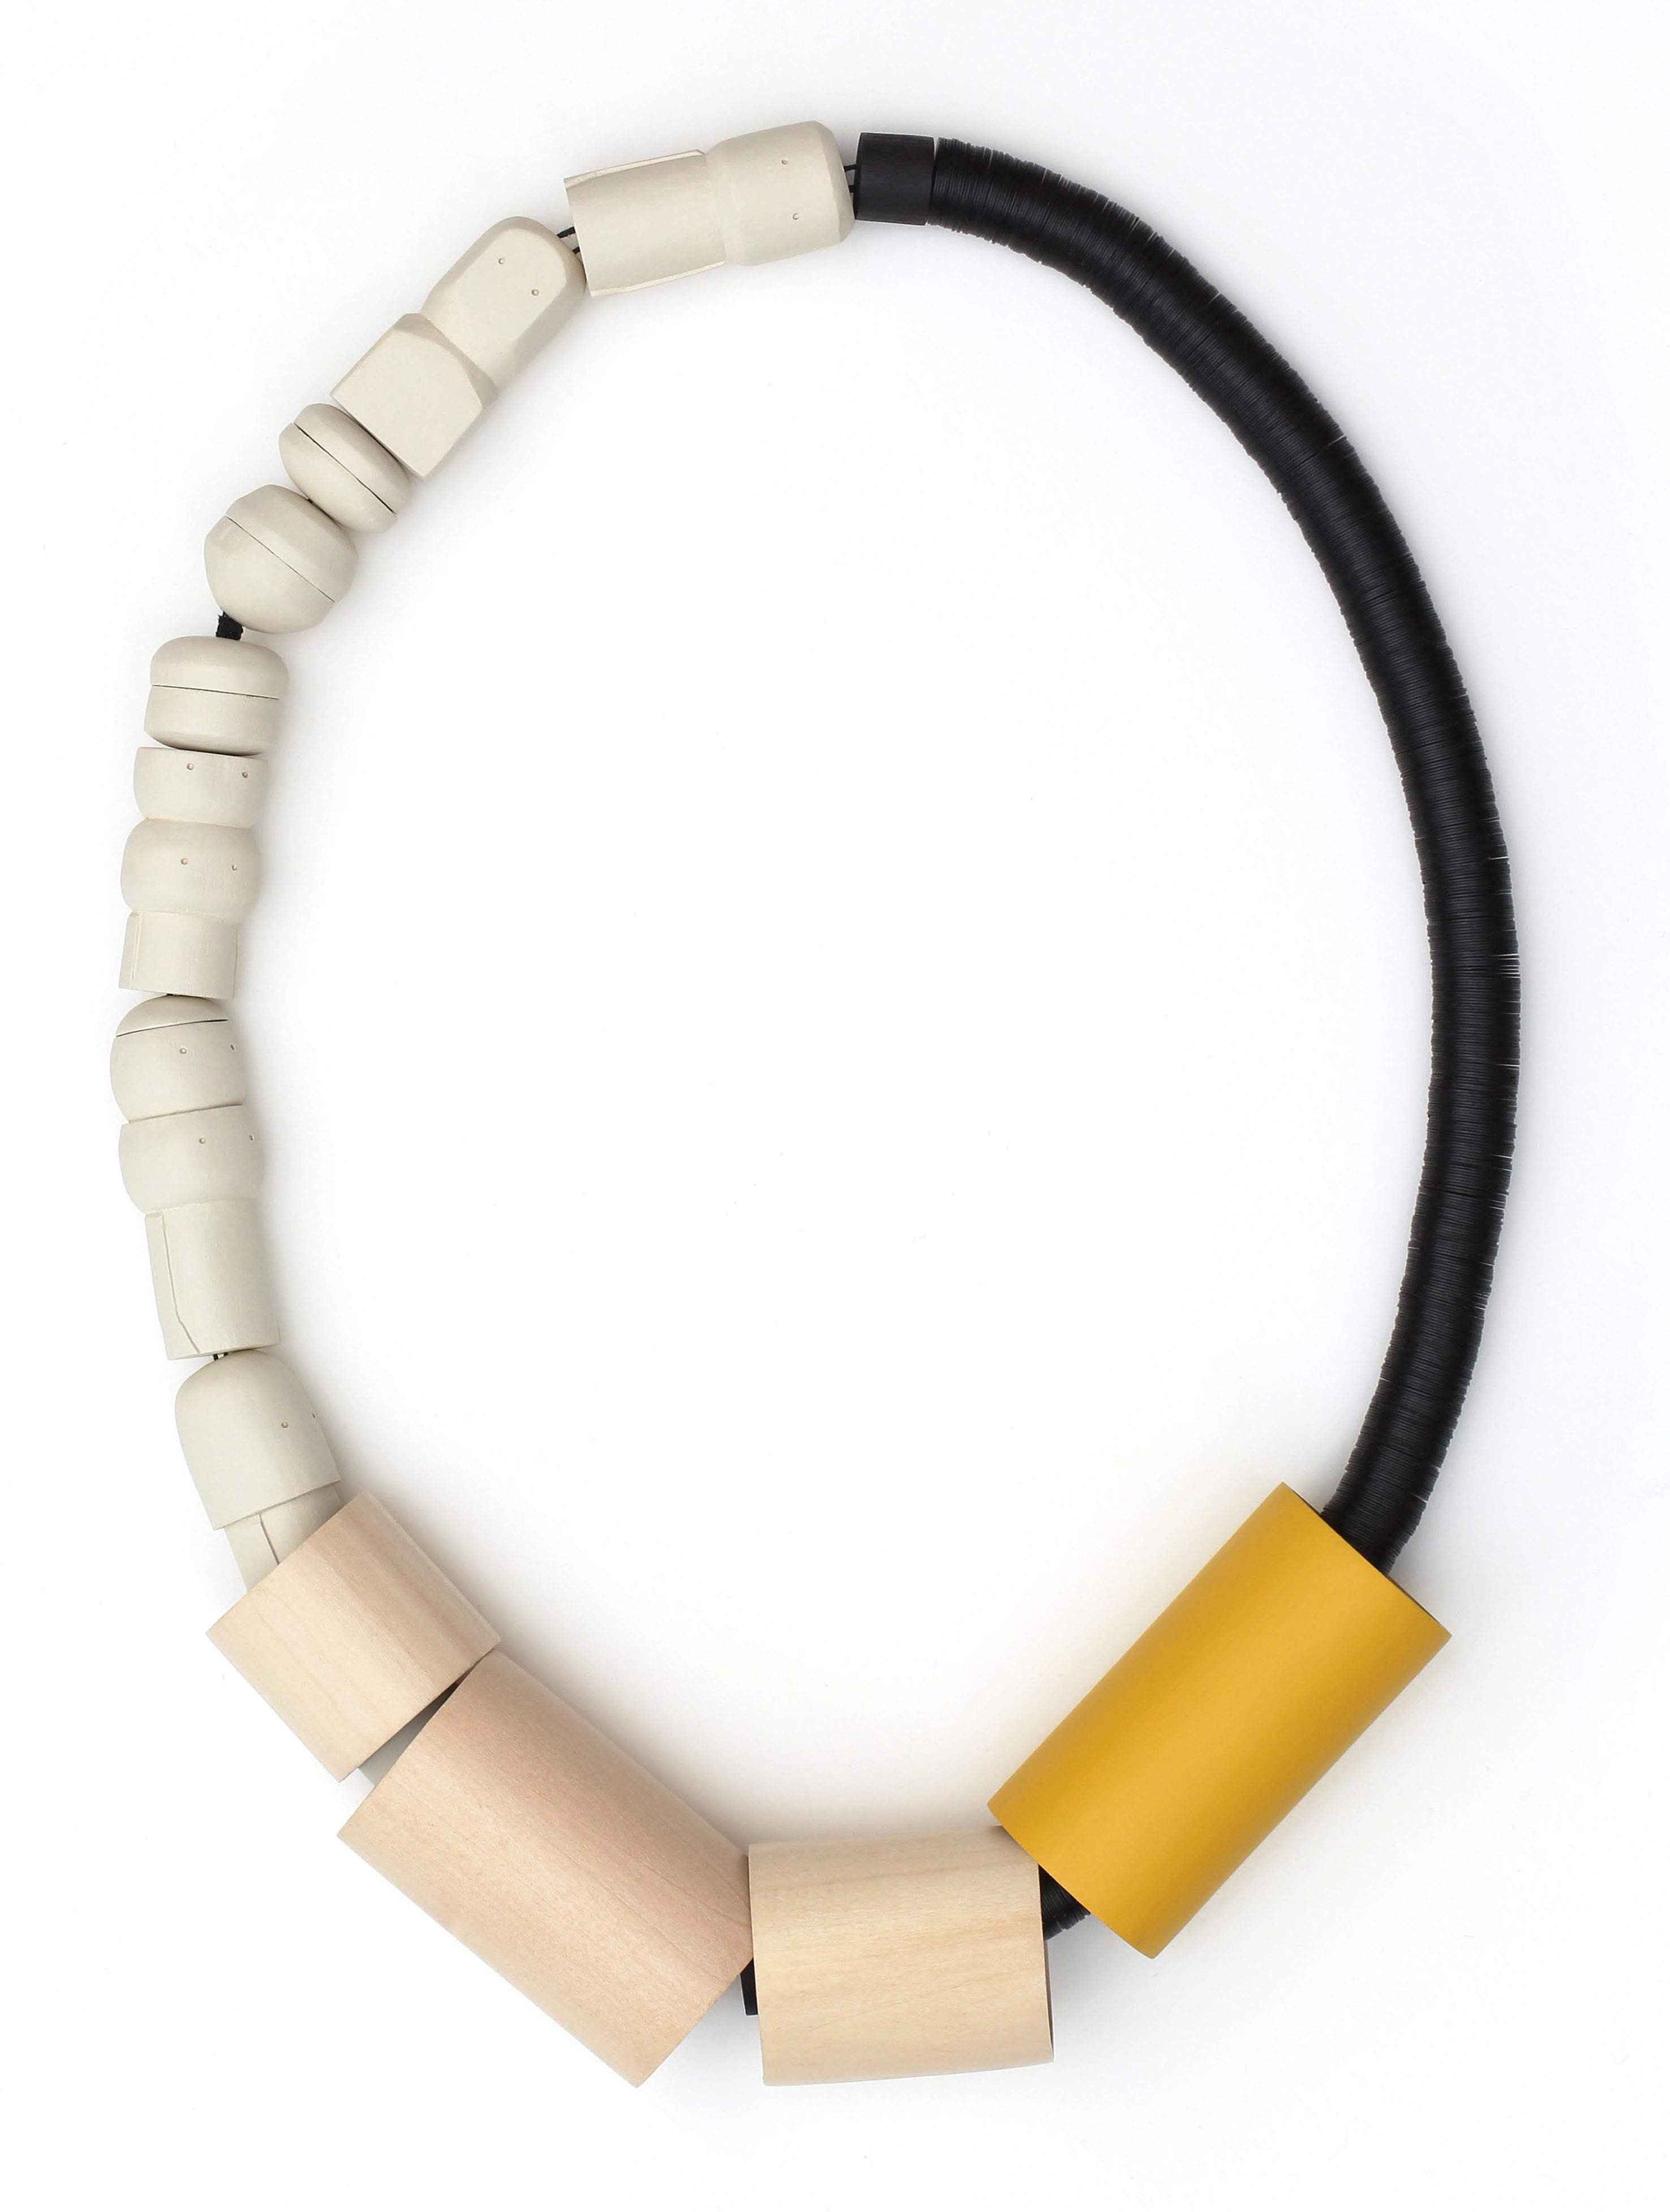 Karin Herwegh, Slow Motion, halssieraad, 2019, hout, textiel, verf